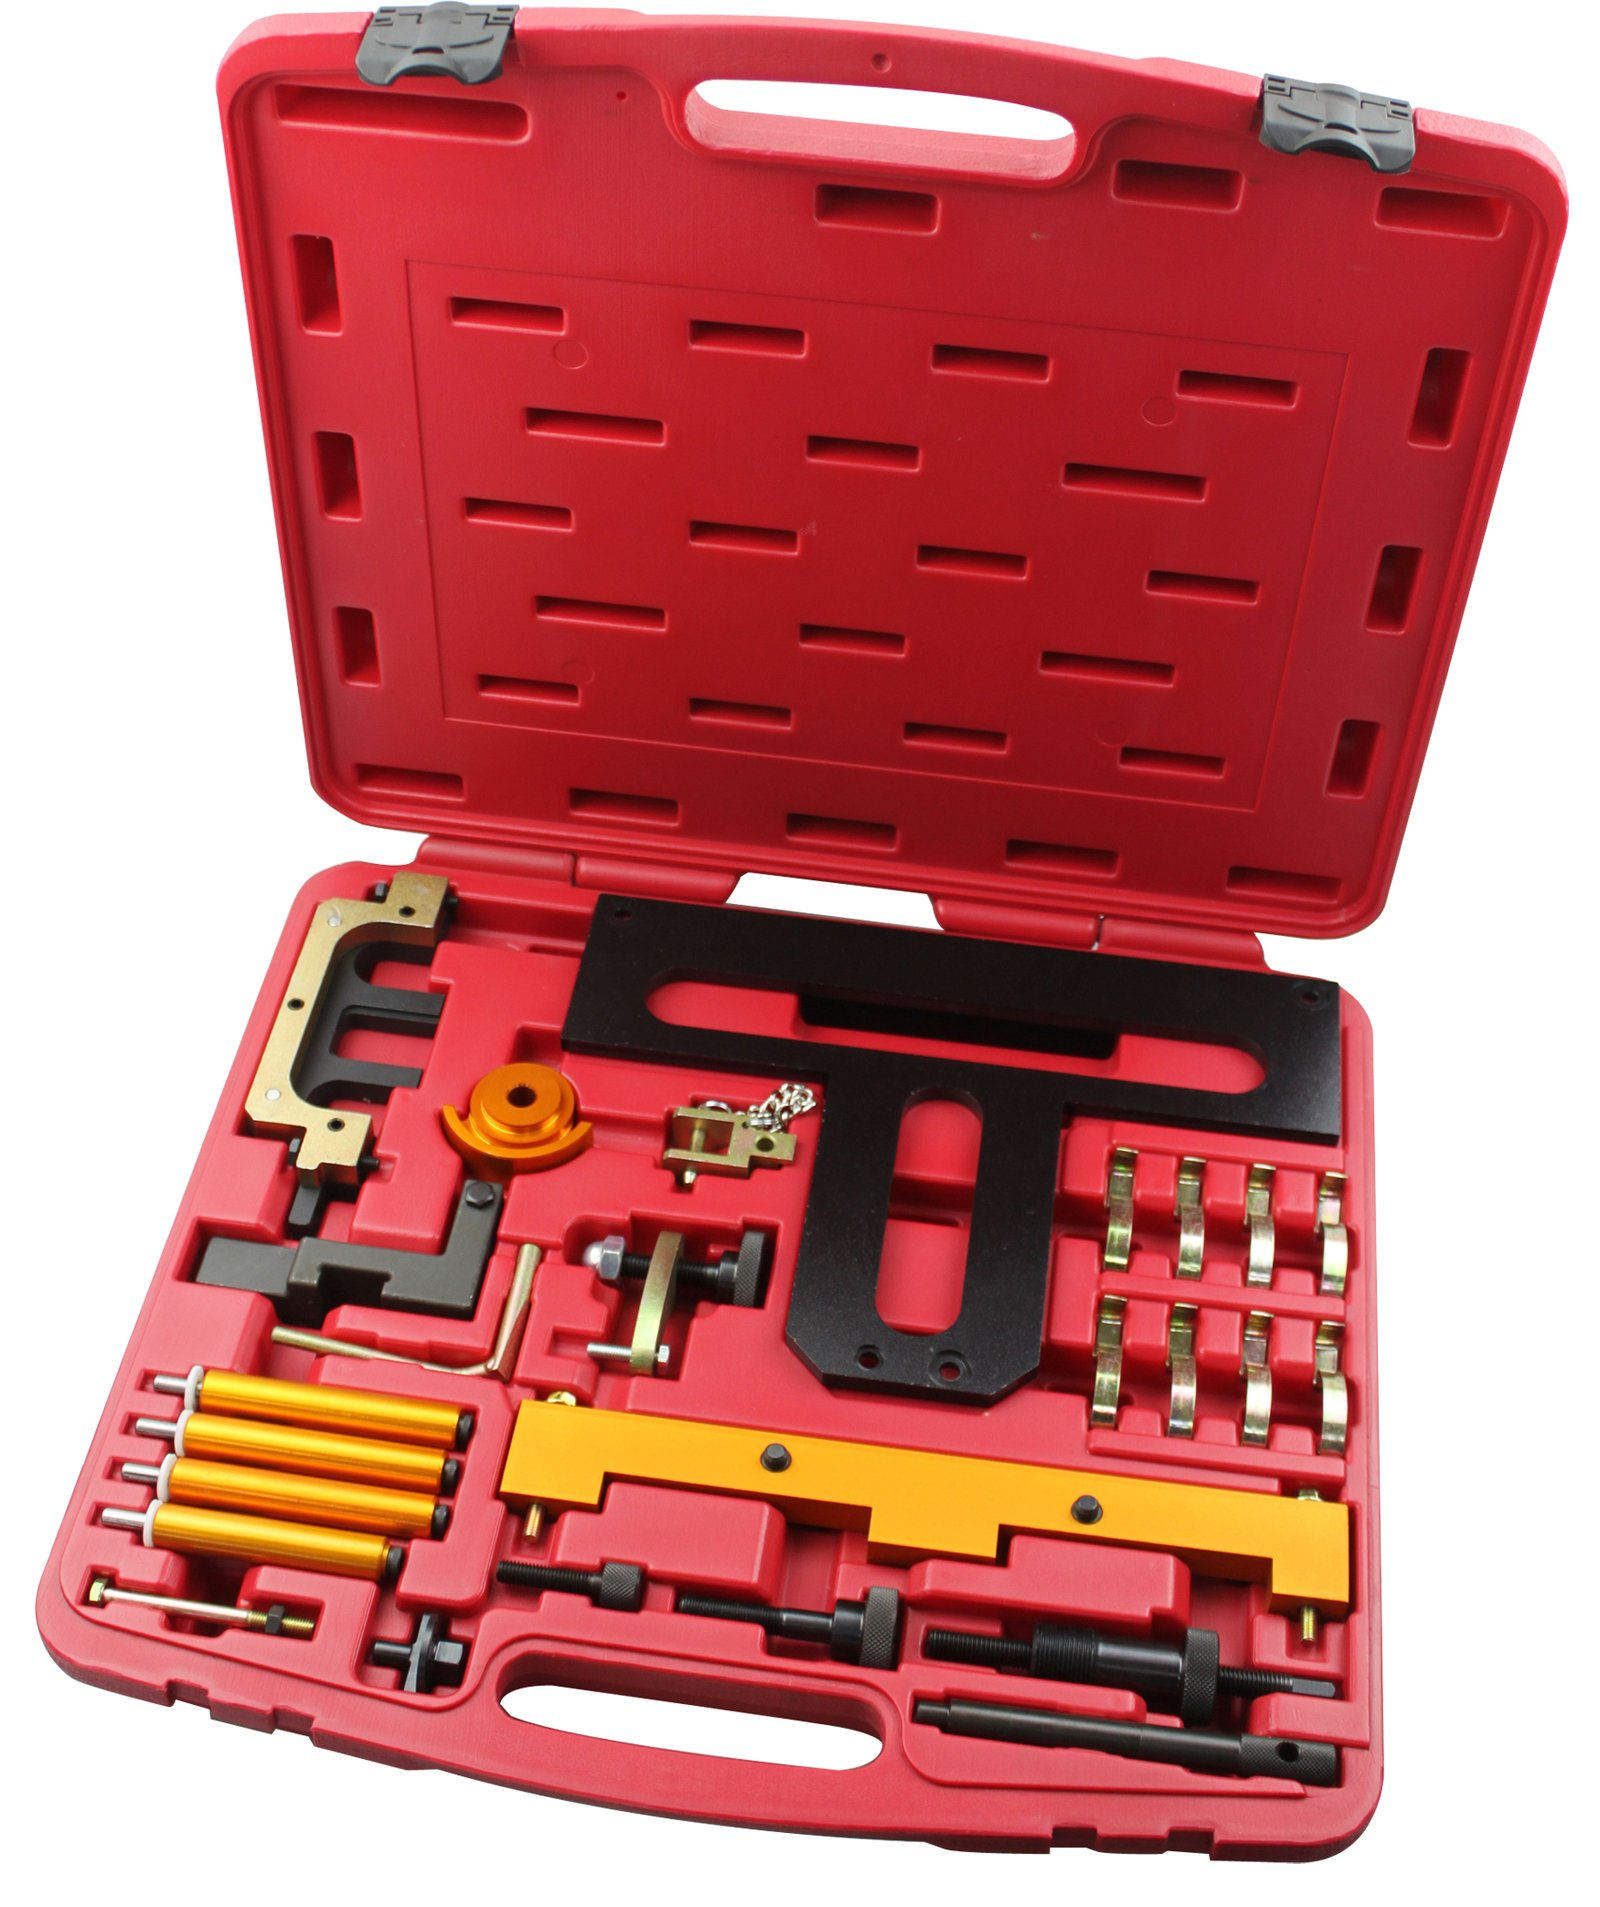 TT-9011 MASTER ENGINE TIMING TOOL SET FOR BMW - N42 N46 N46T E81 E87 E46 E60 E90